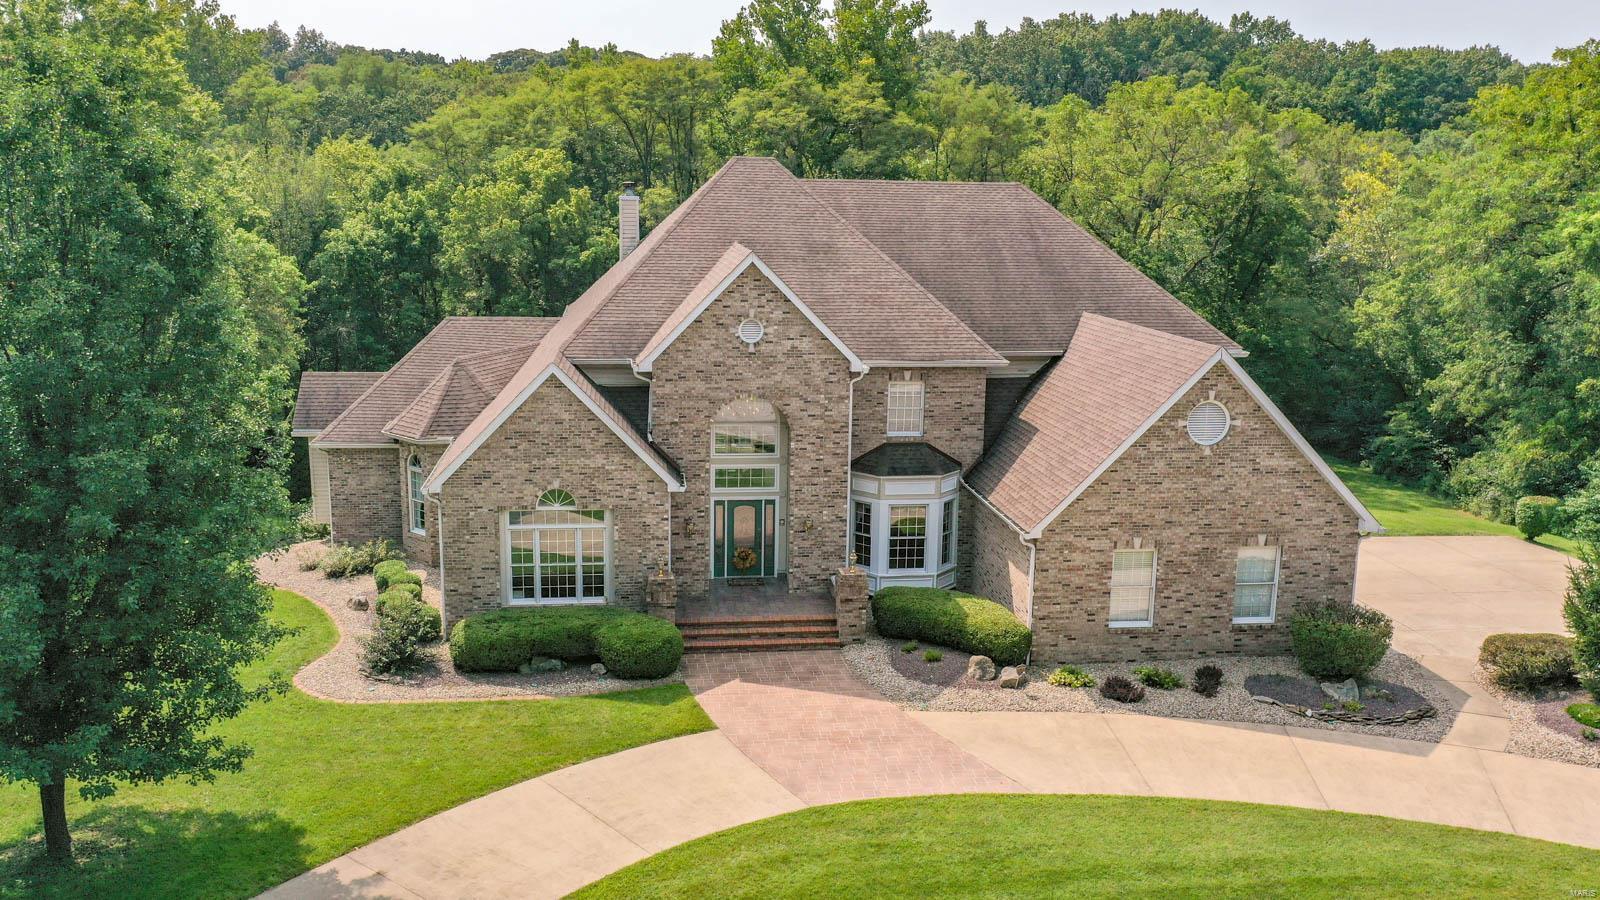 2331 Pebble Creek Drive Property Photo - Alton, IL real estate listing